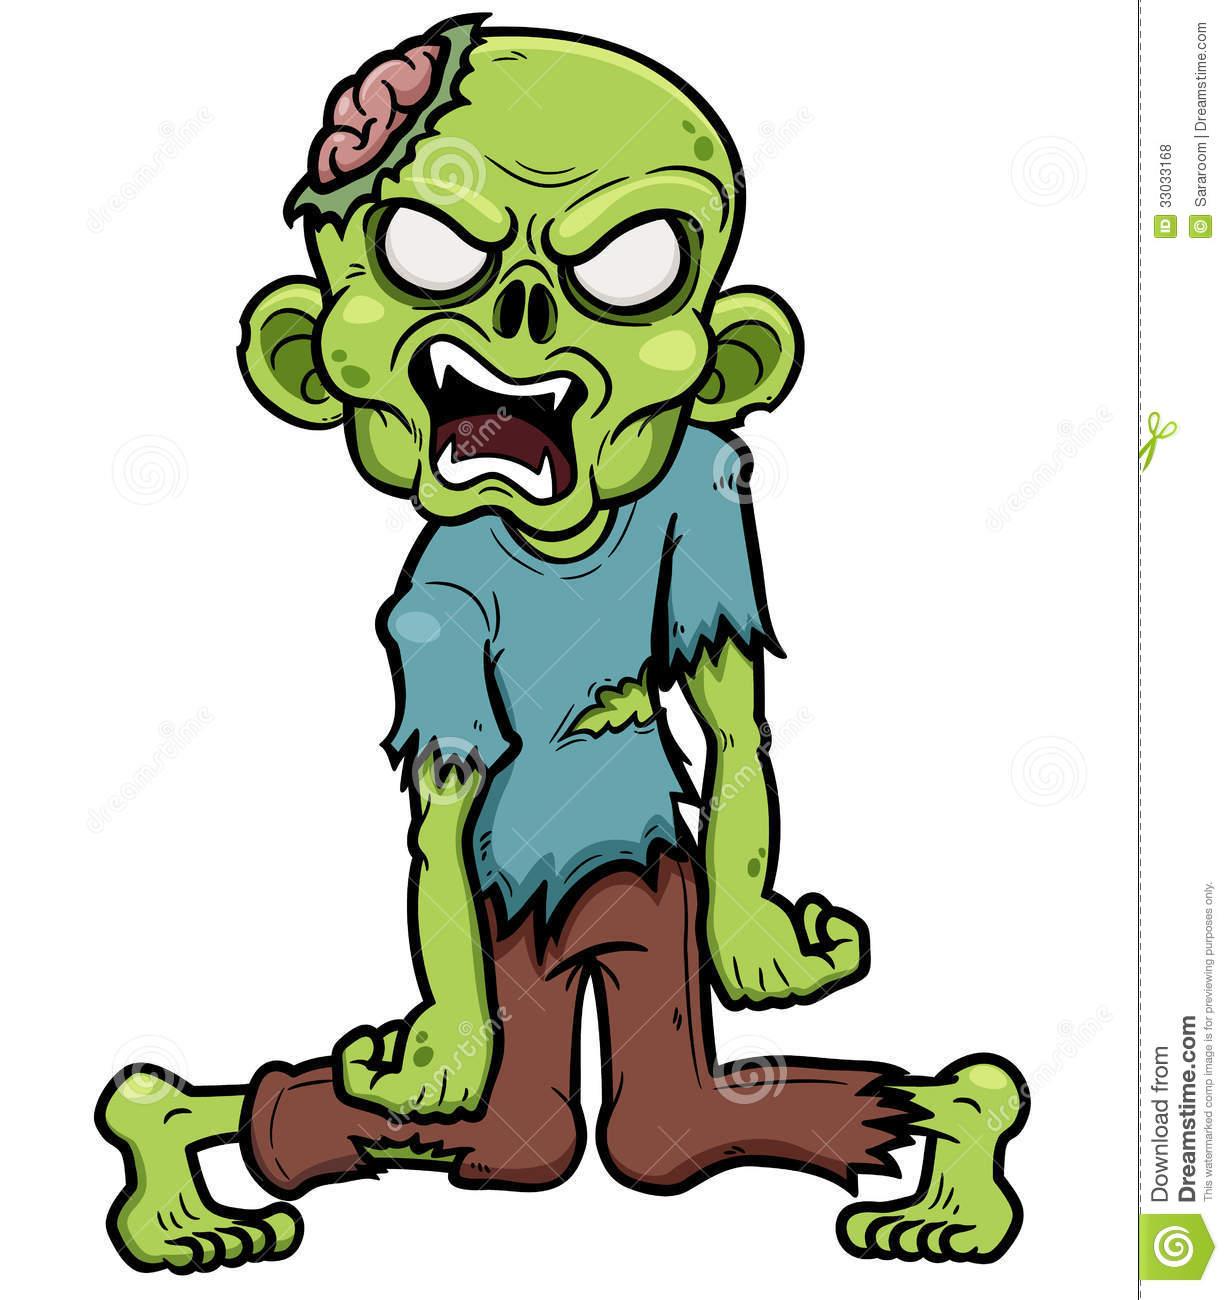 Zombie clipart green Cartoon zombie Zombie Search cartoon